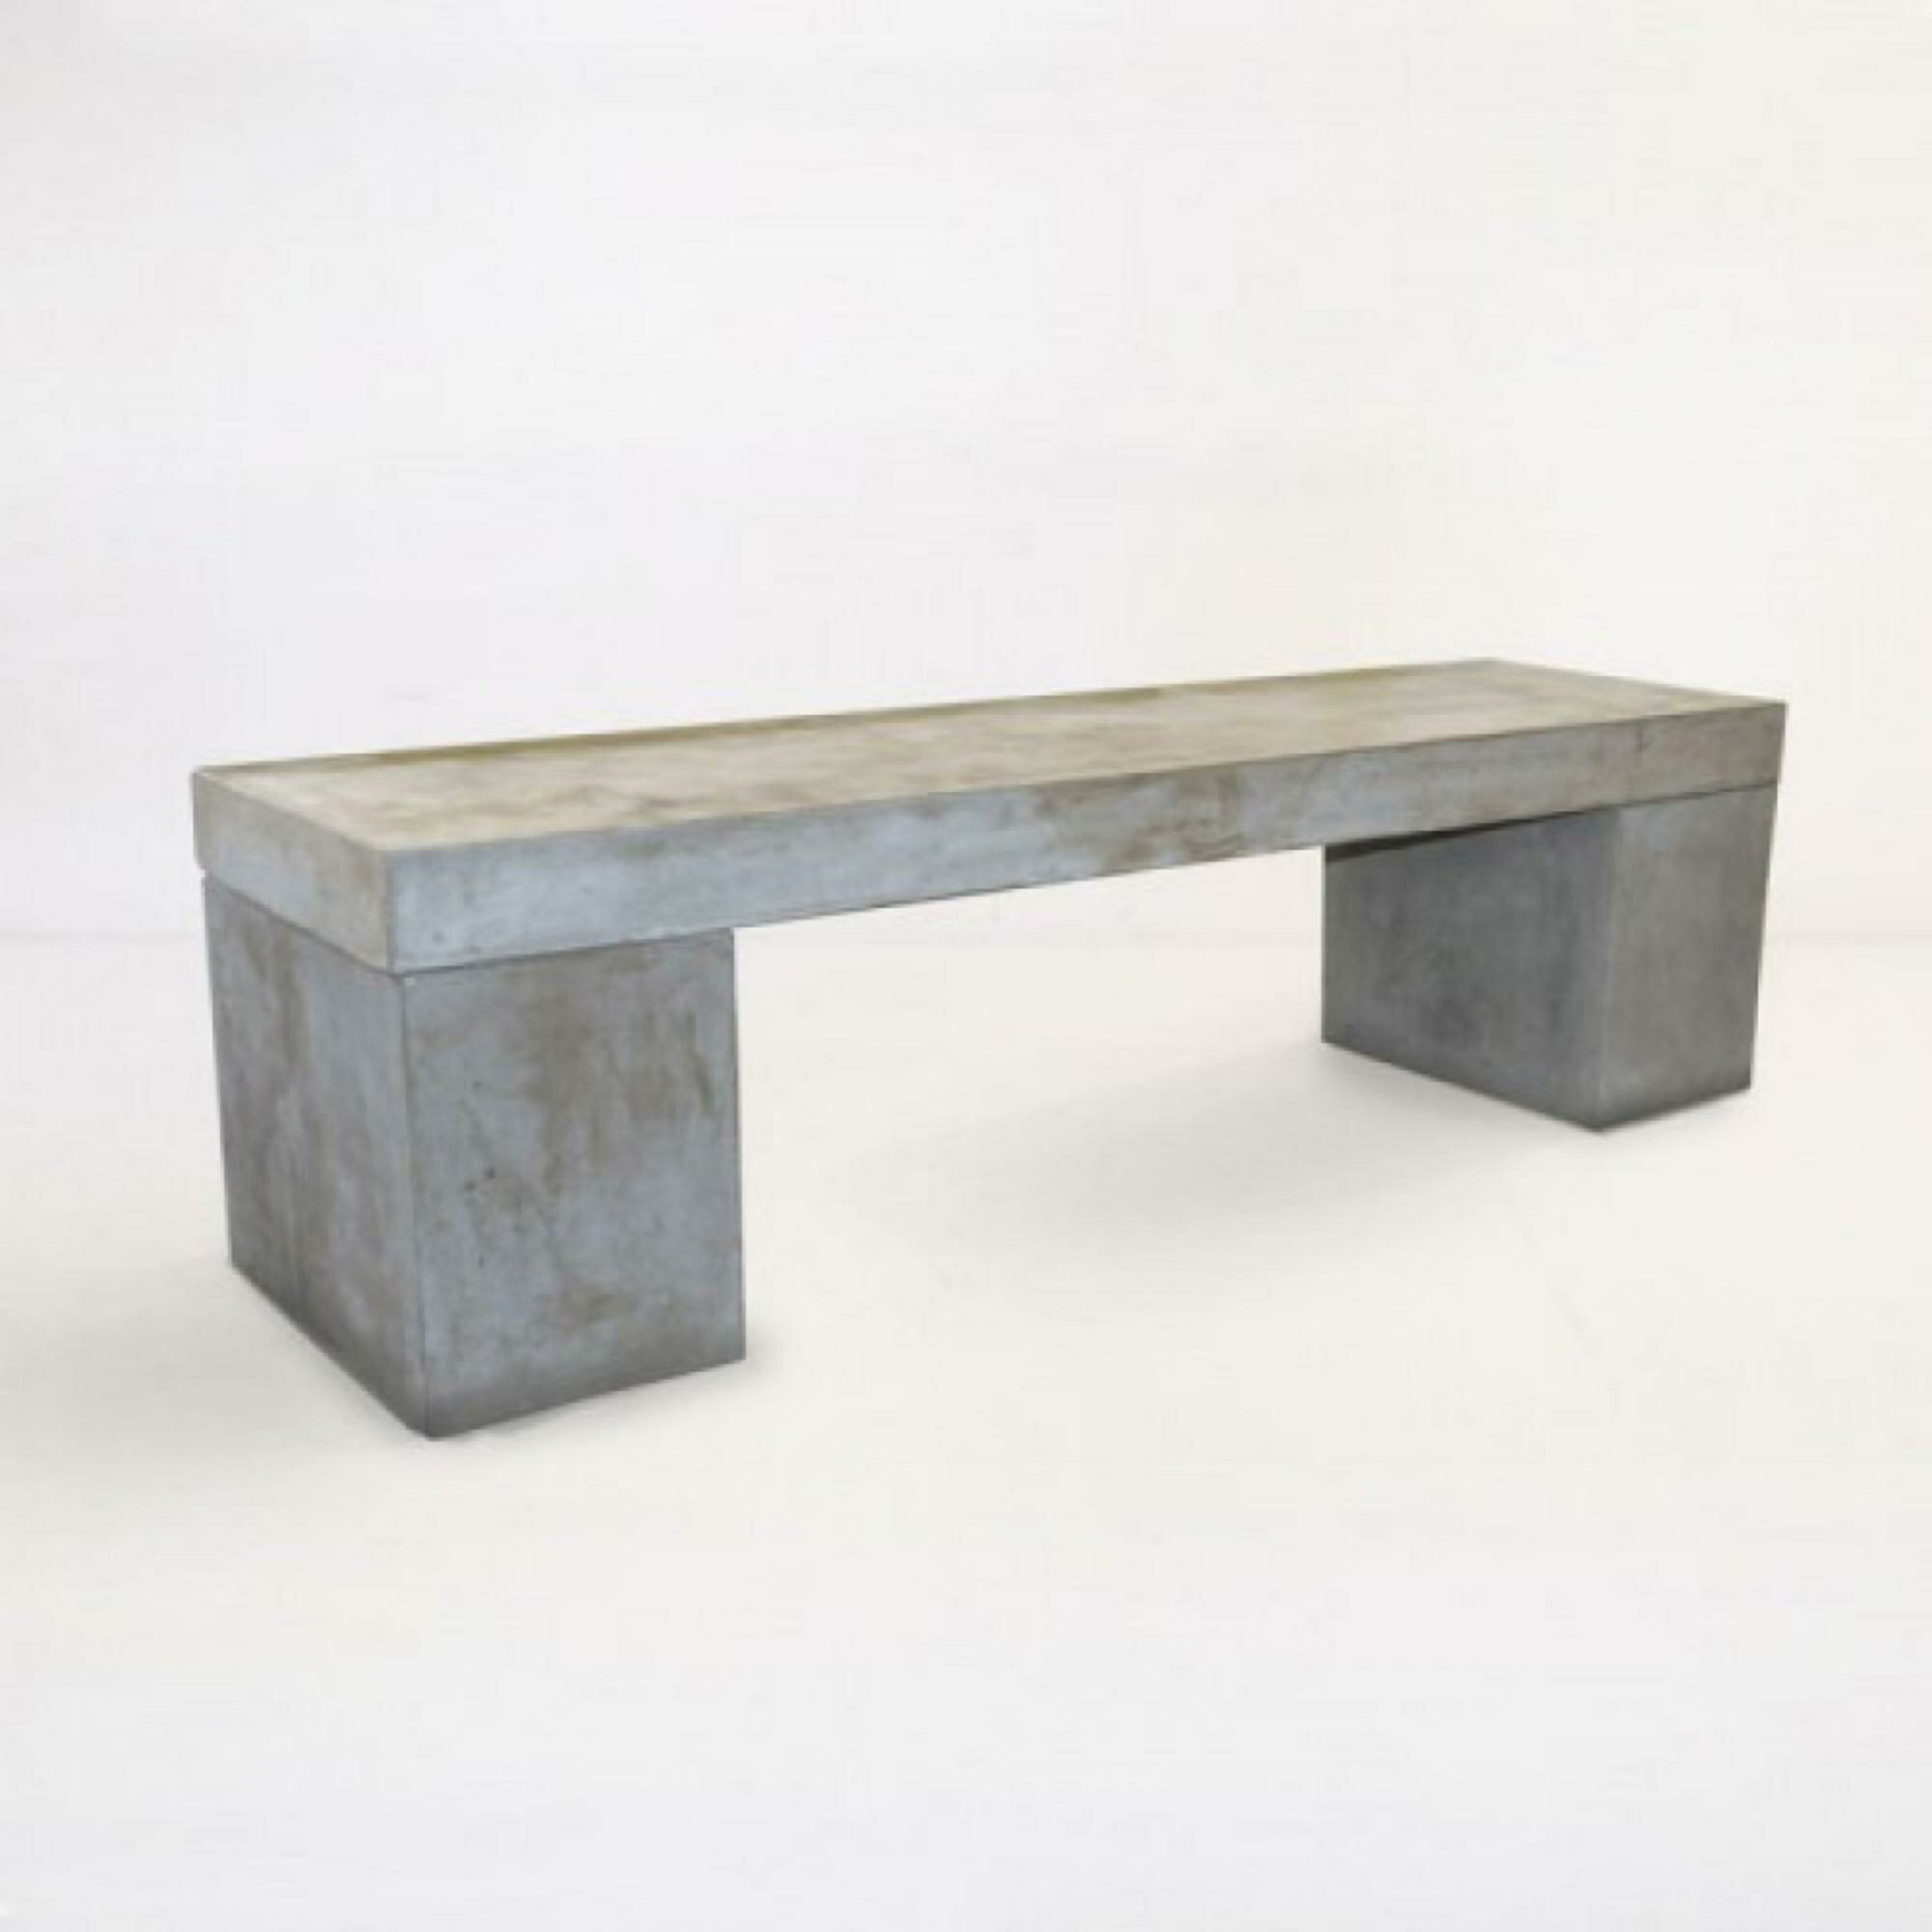 Miraculous Kasey Sturdy Leg Fiber Reinforced Concrete Garden Bench Uwap Interior Chair Design Uwaporg